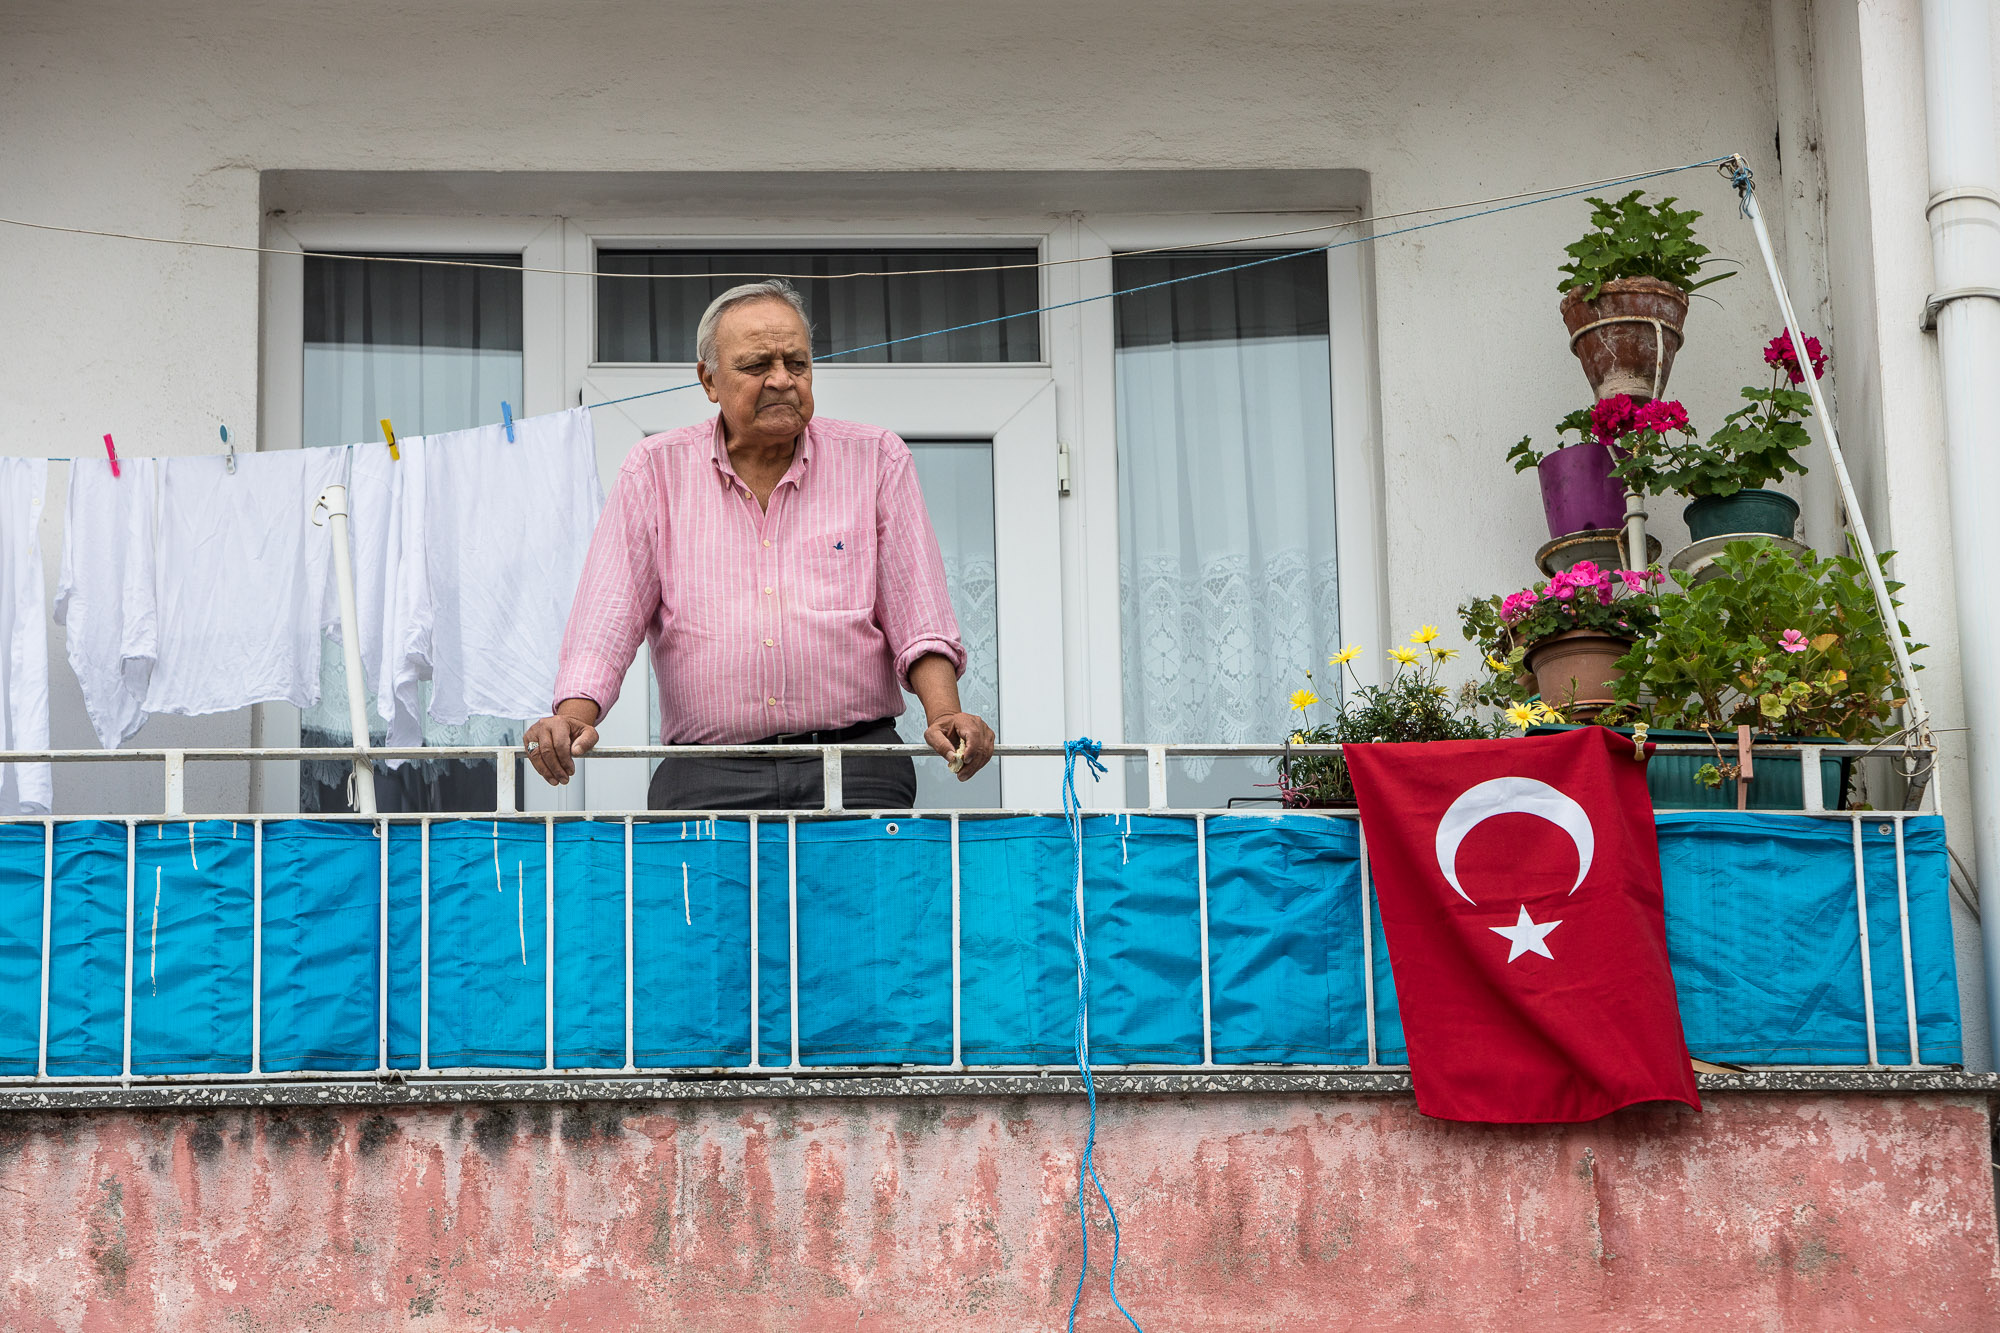 man with Turkish flag on balcony